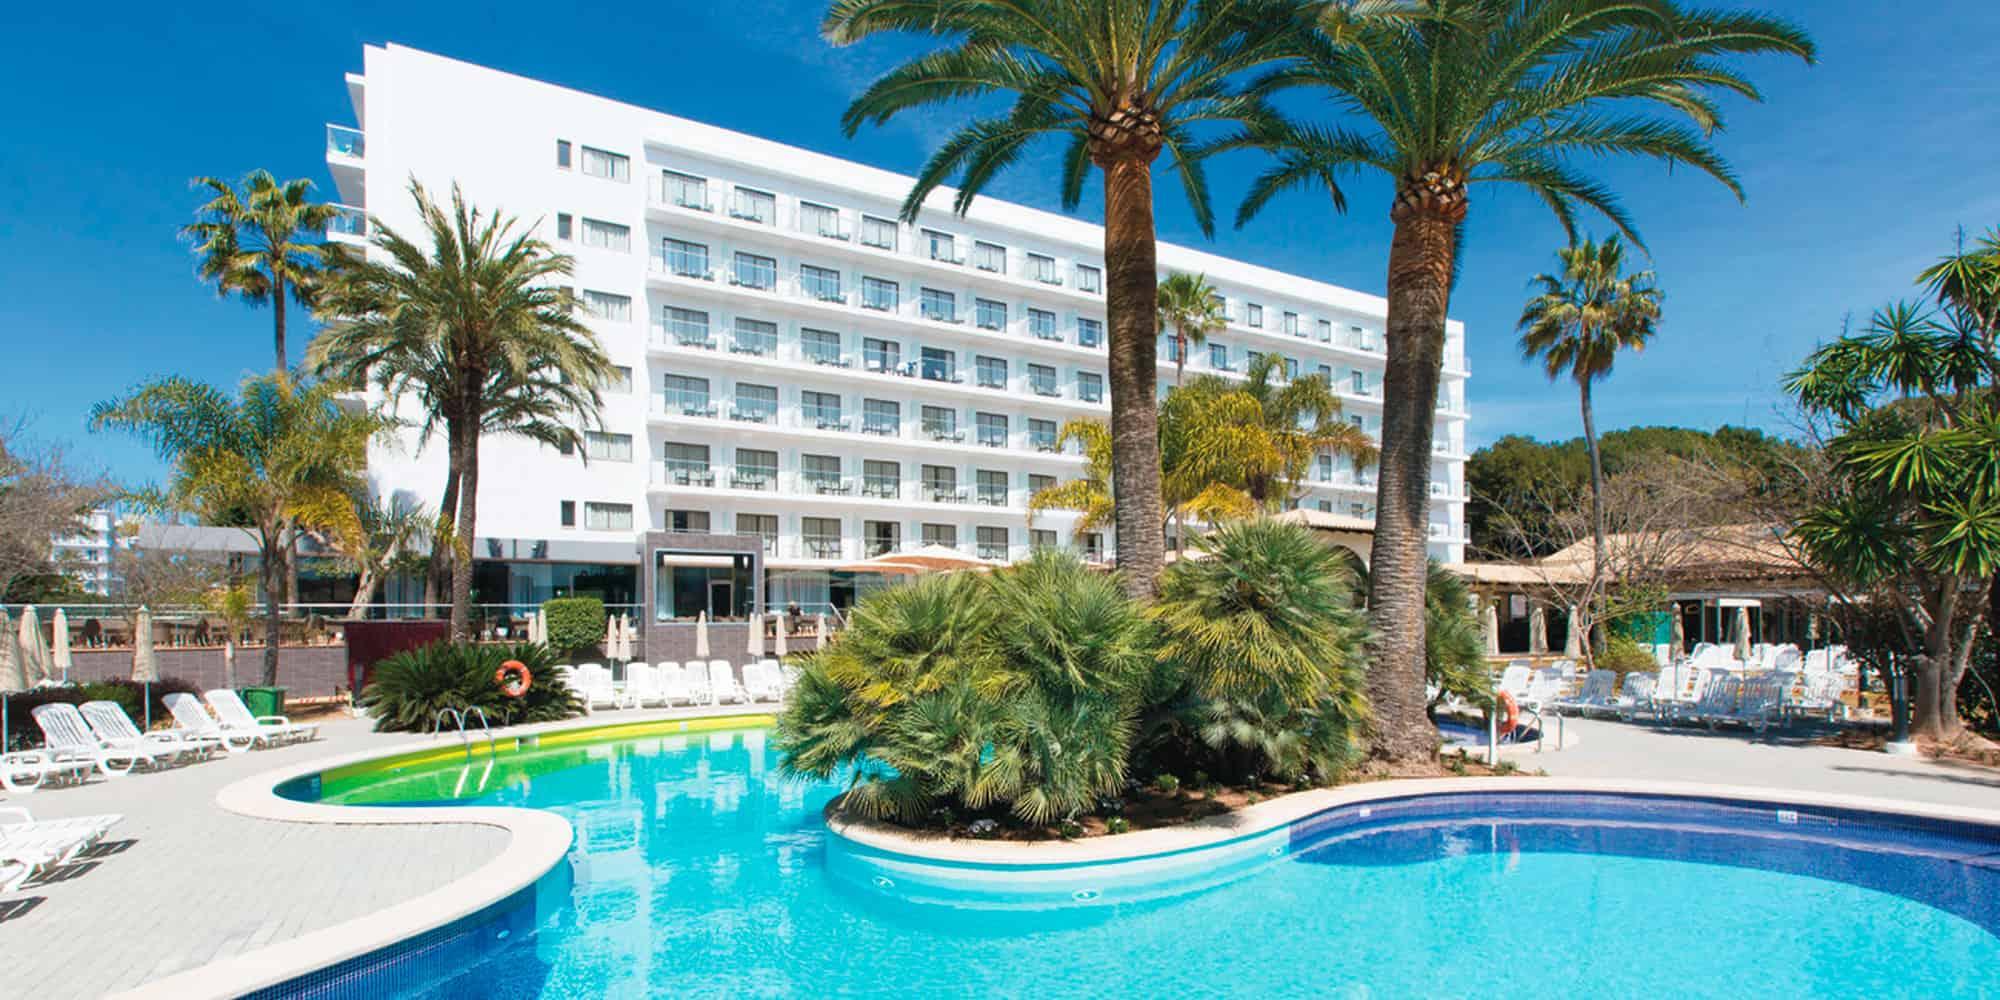 Hotel riu palace tres islas wellnesshotel strand van corralejo - Hotel Riu Palace Tres Islas Wellnesshotel Strand Van Corralejo 13